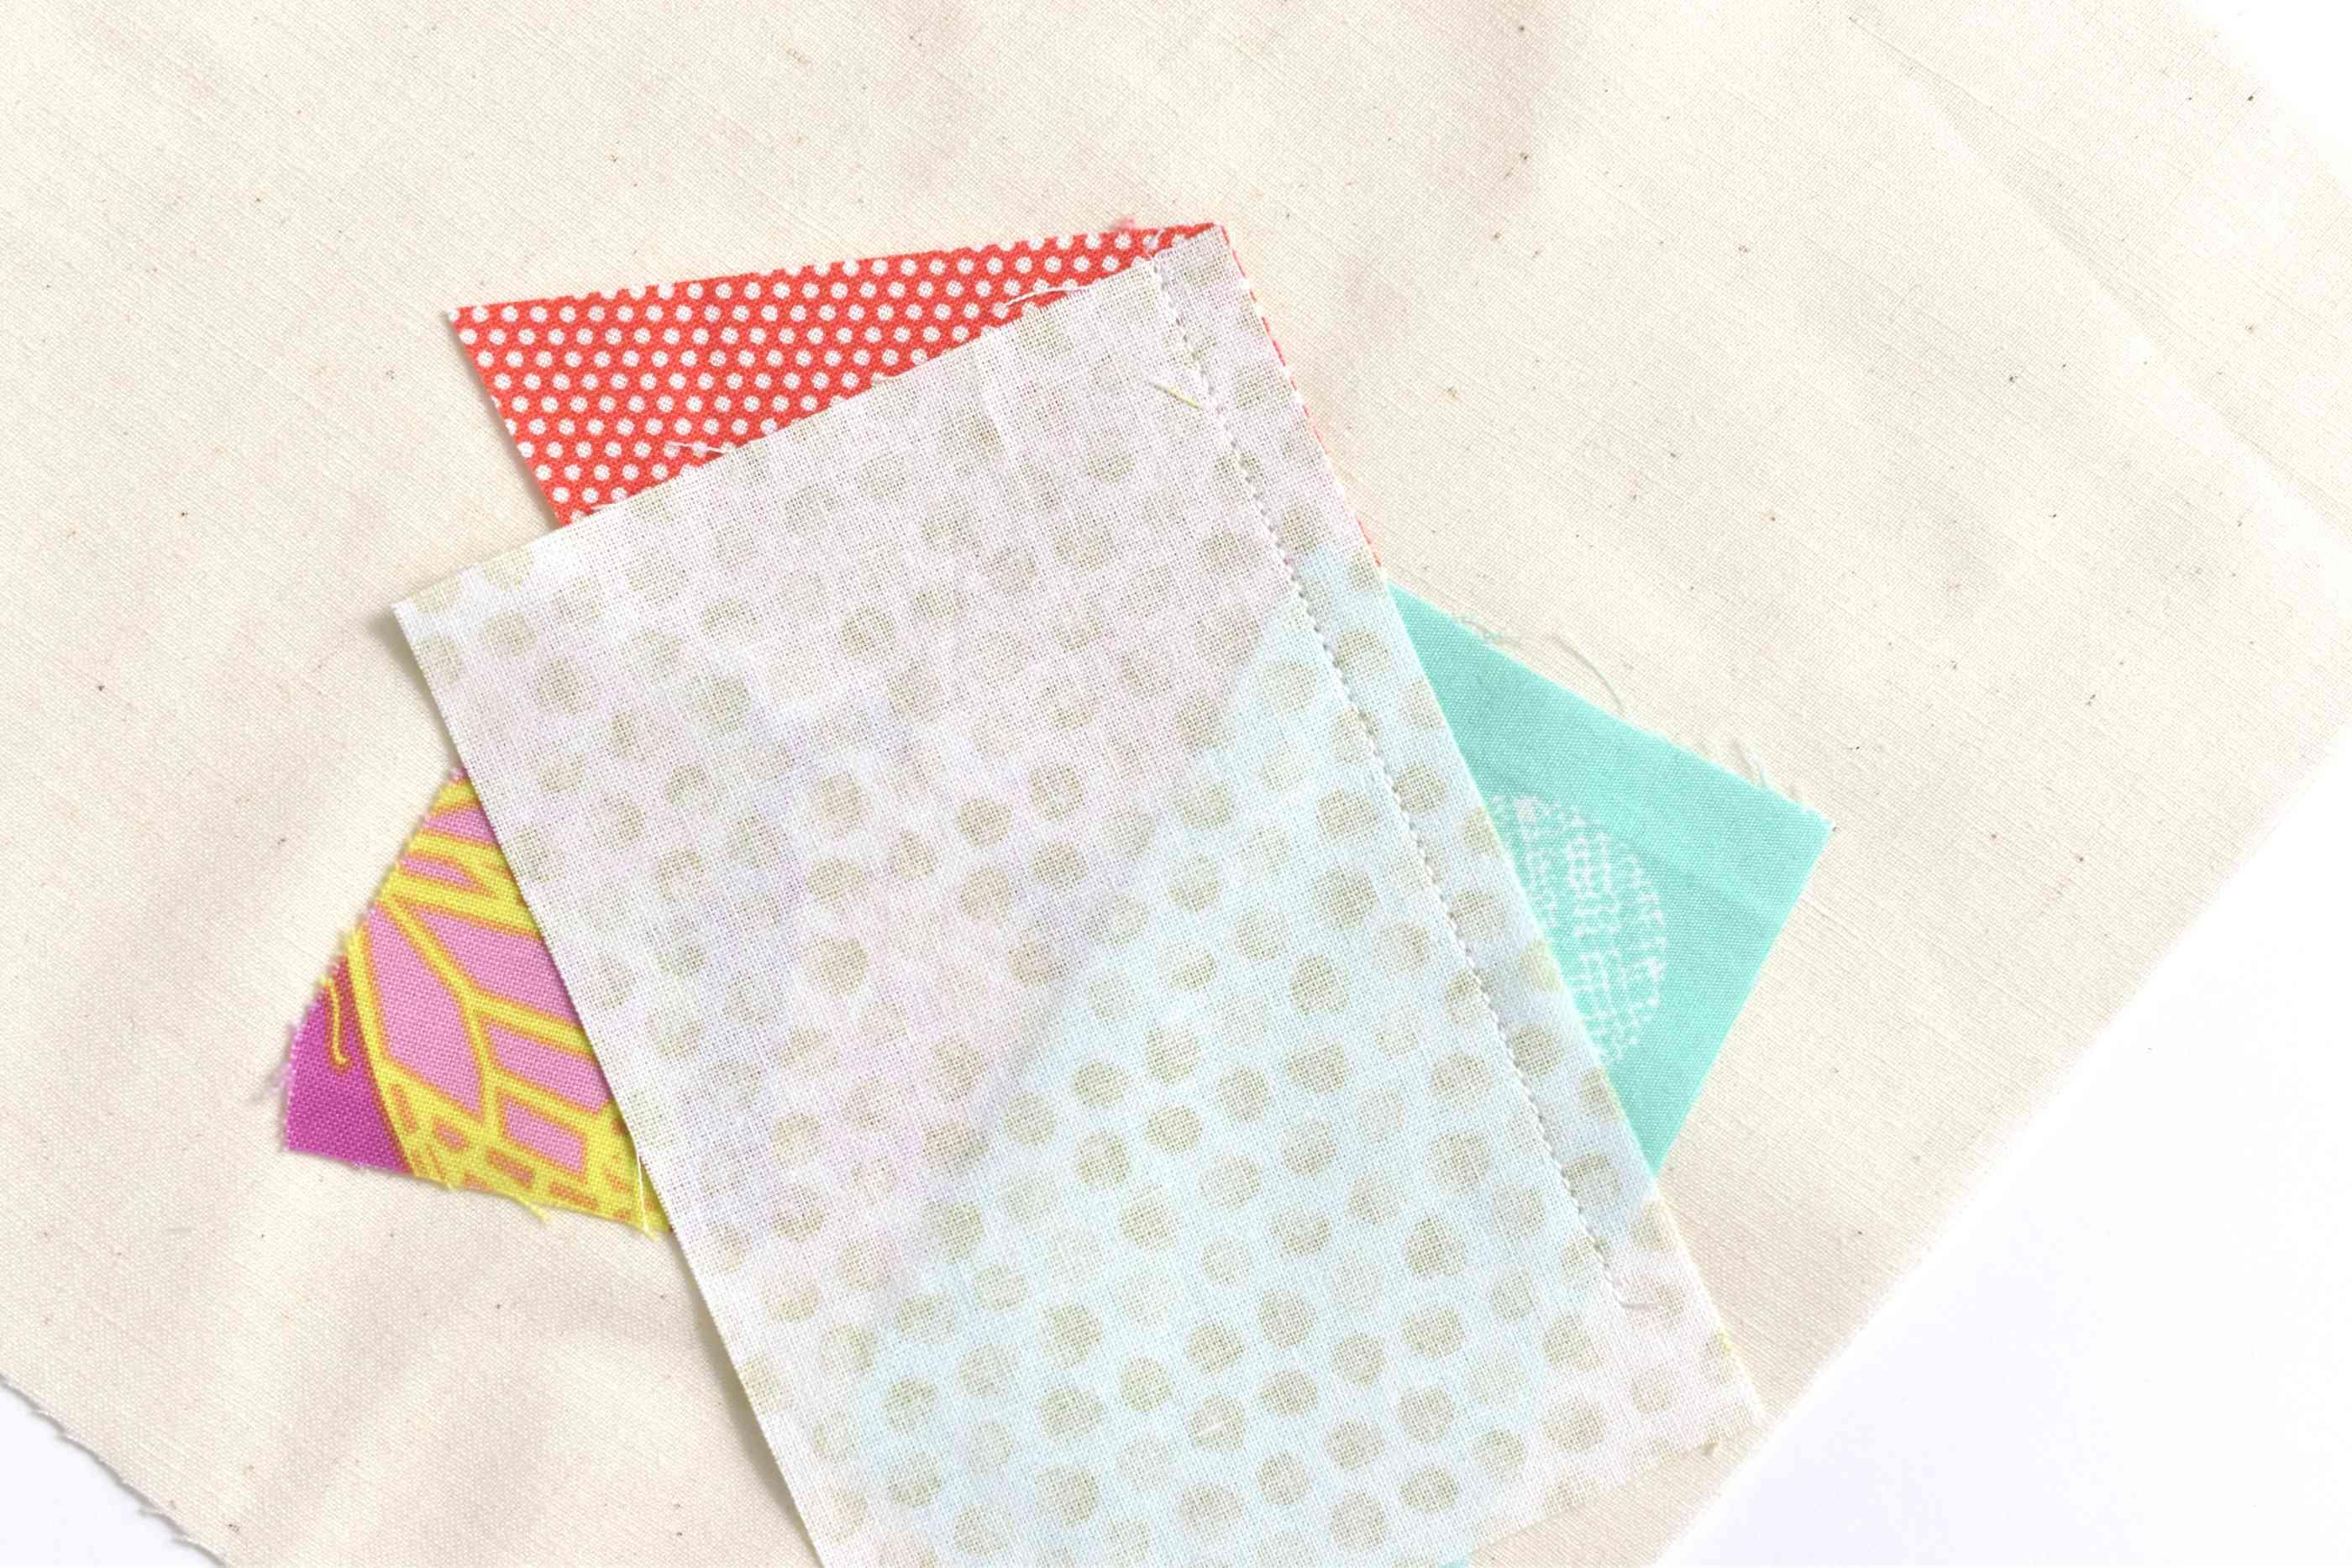 The beginnings of a quilt block